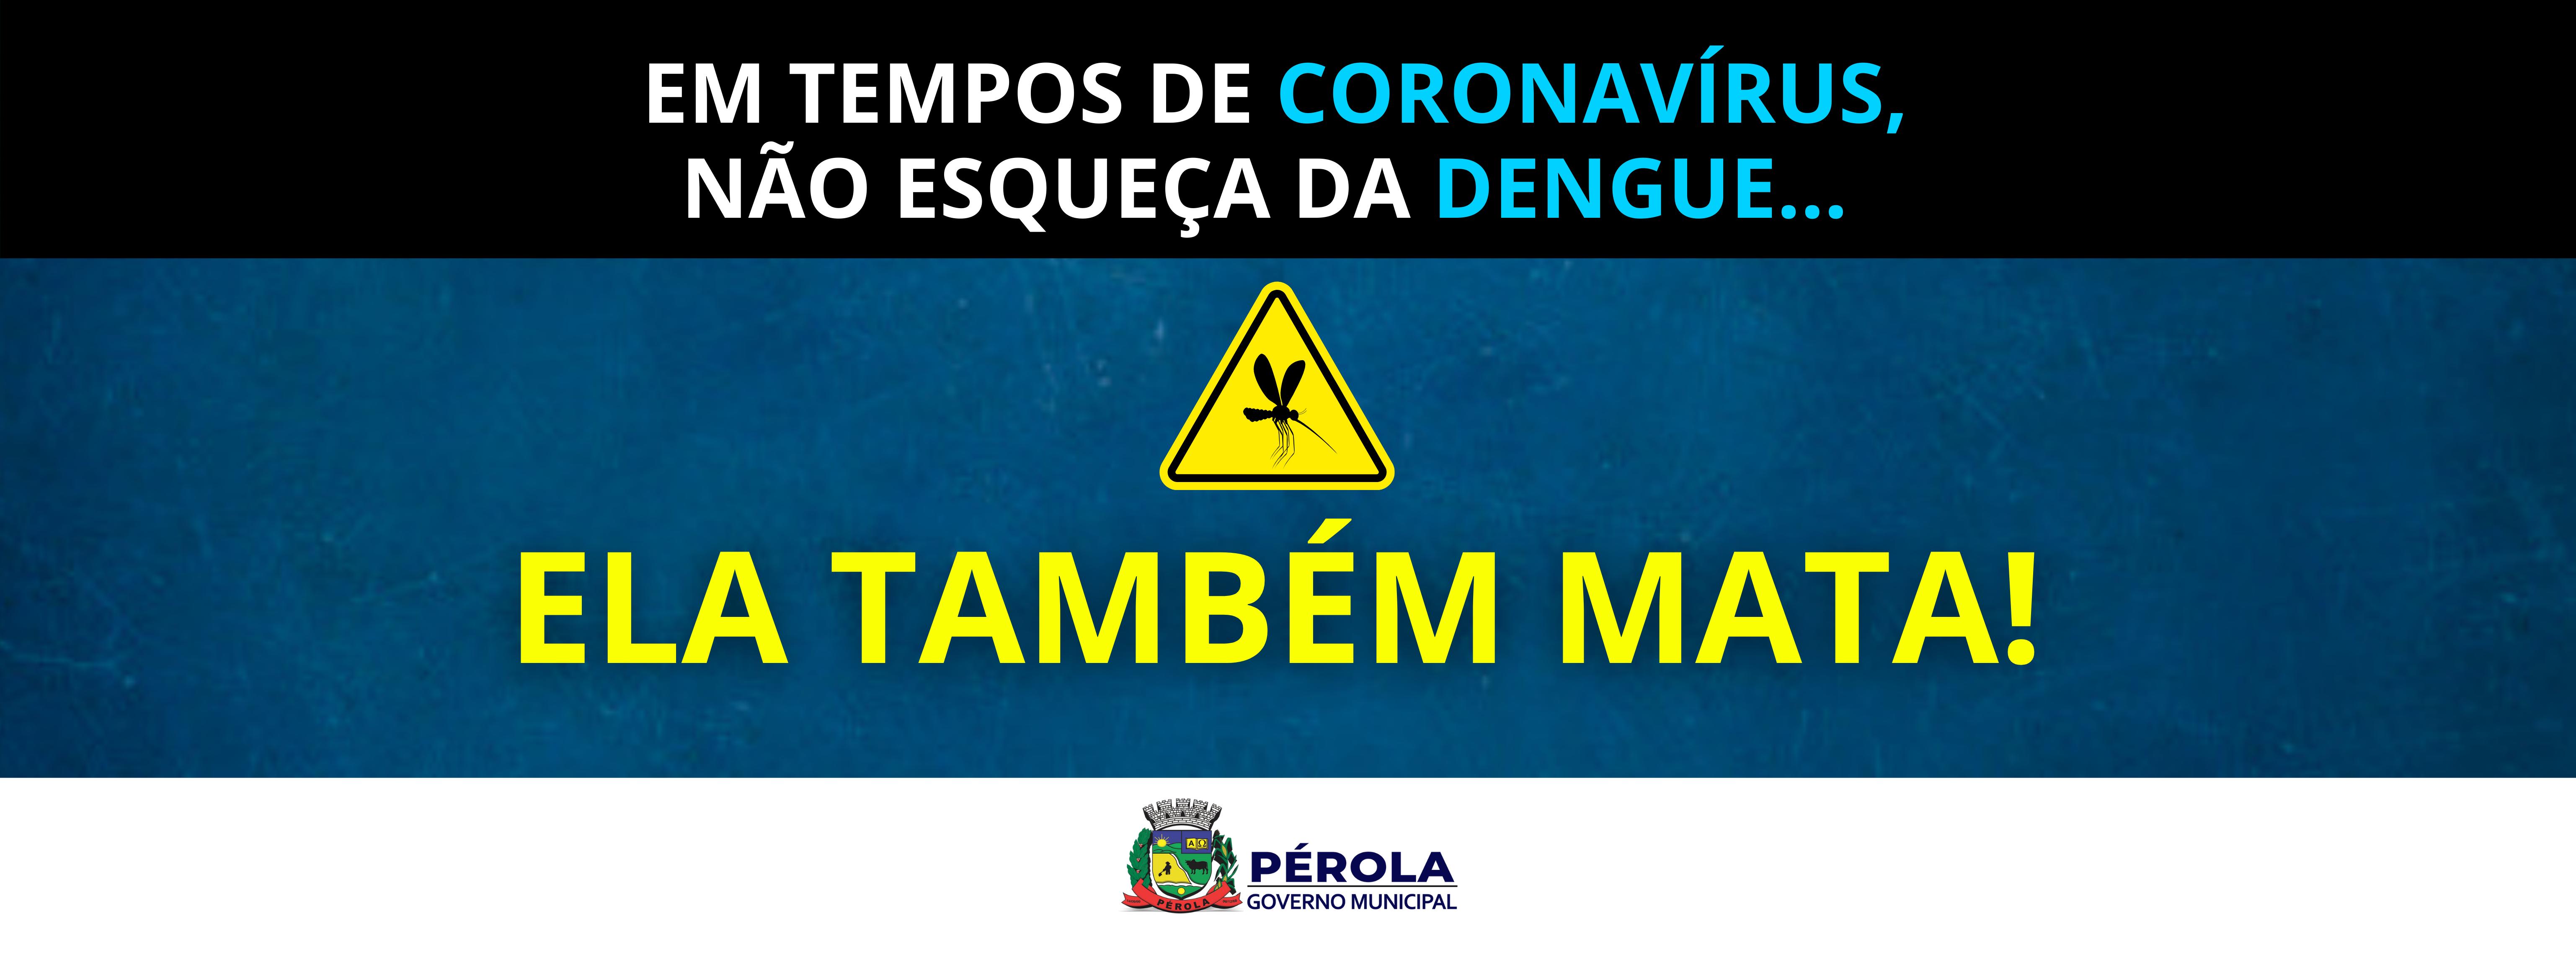 Coronavírus e a dengue matam.